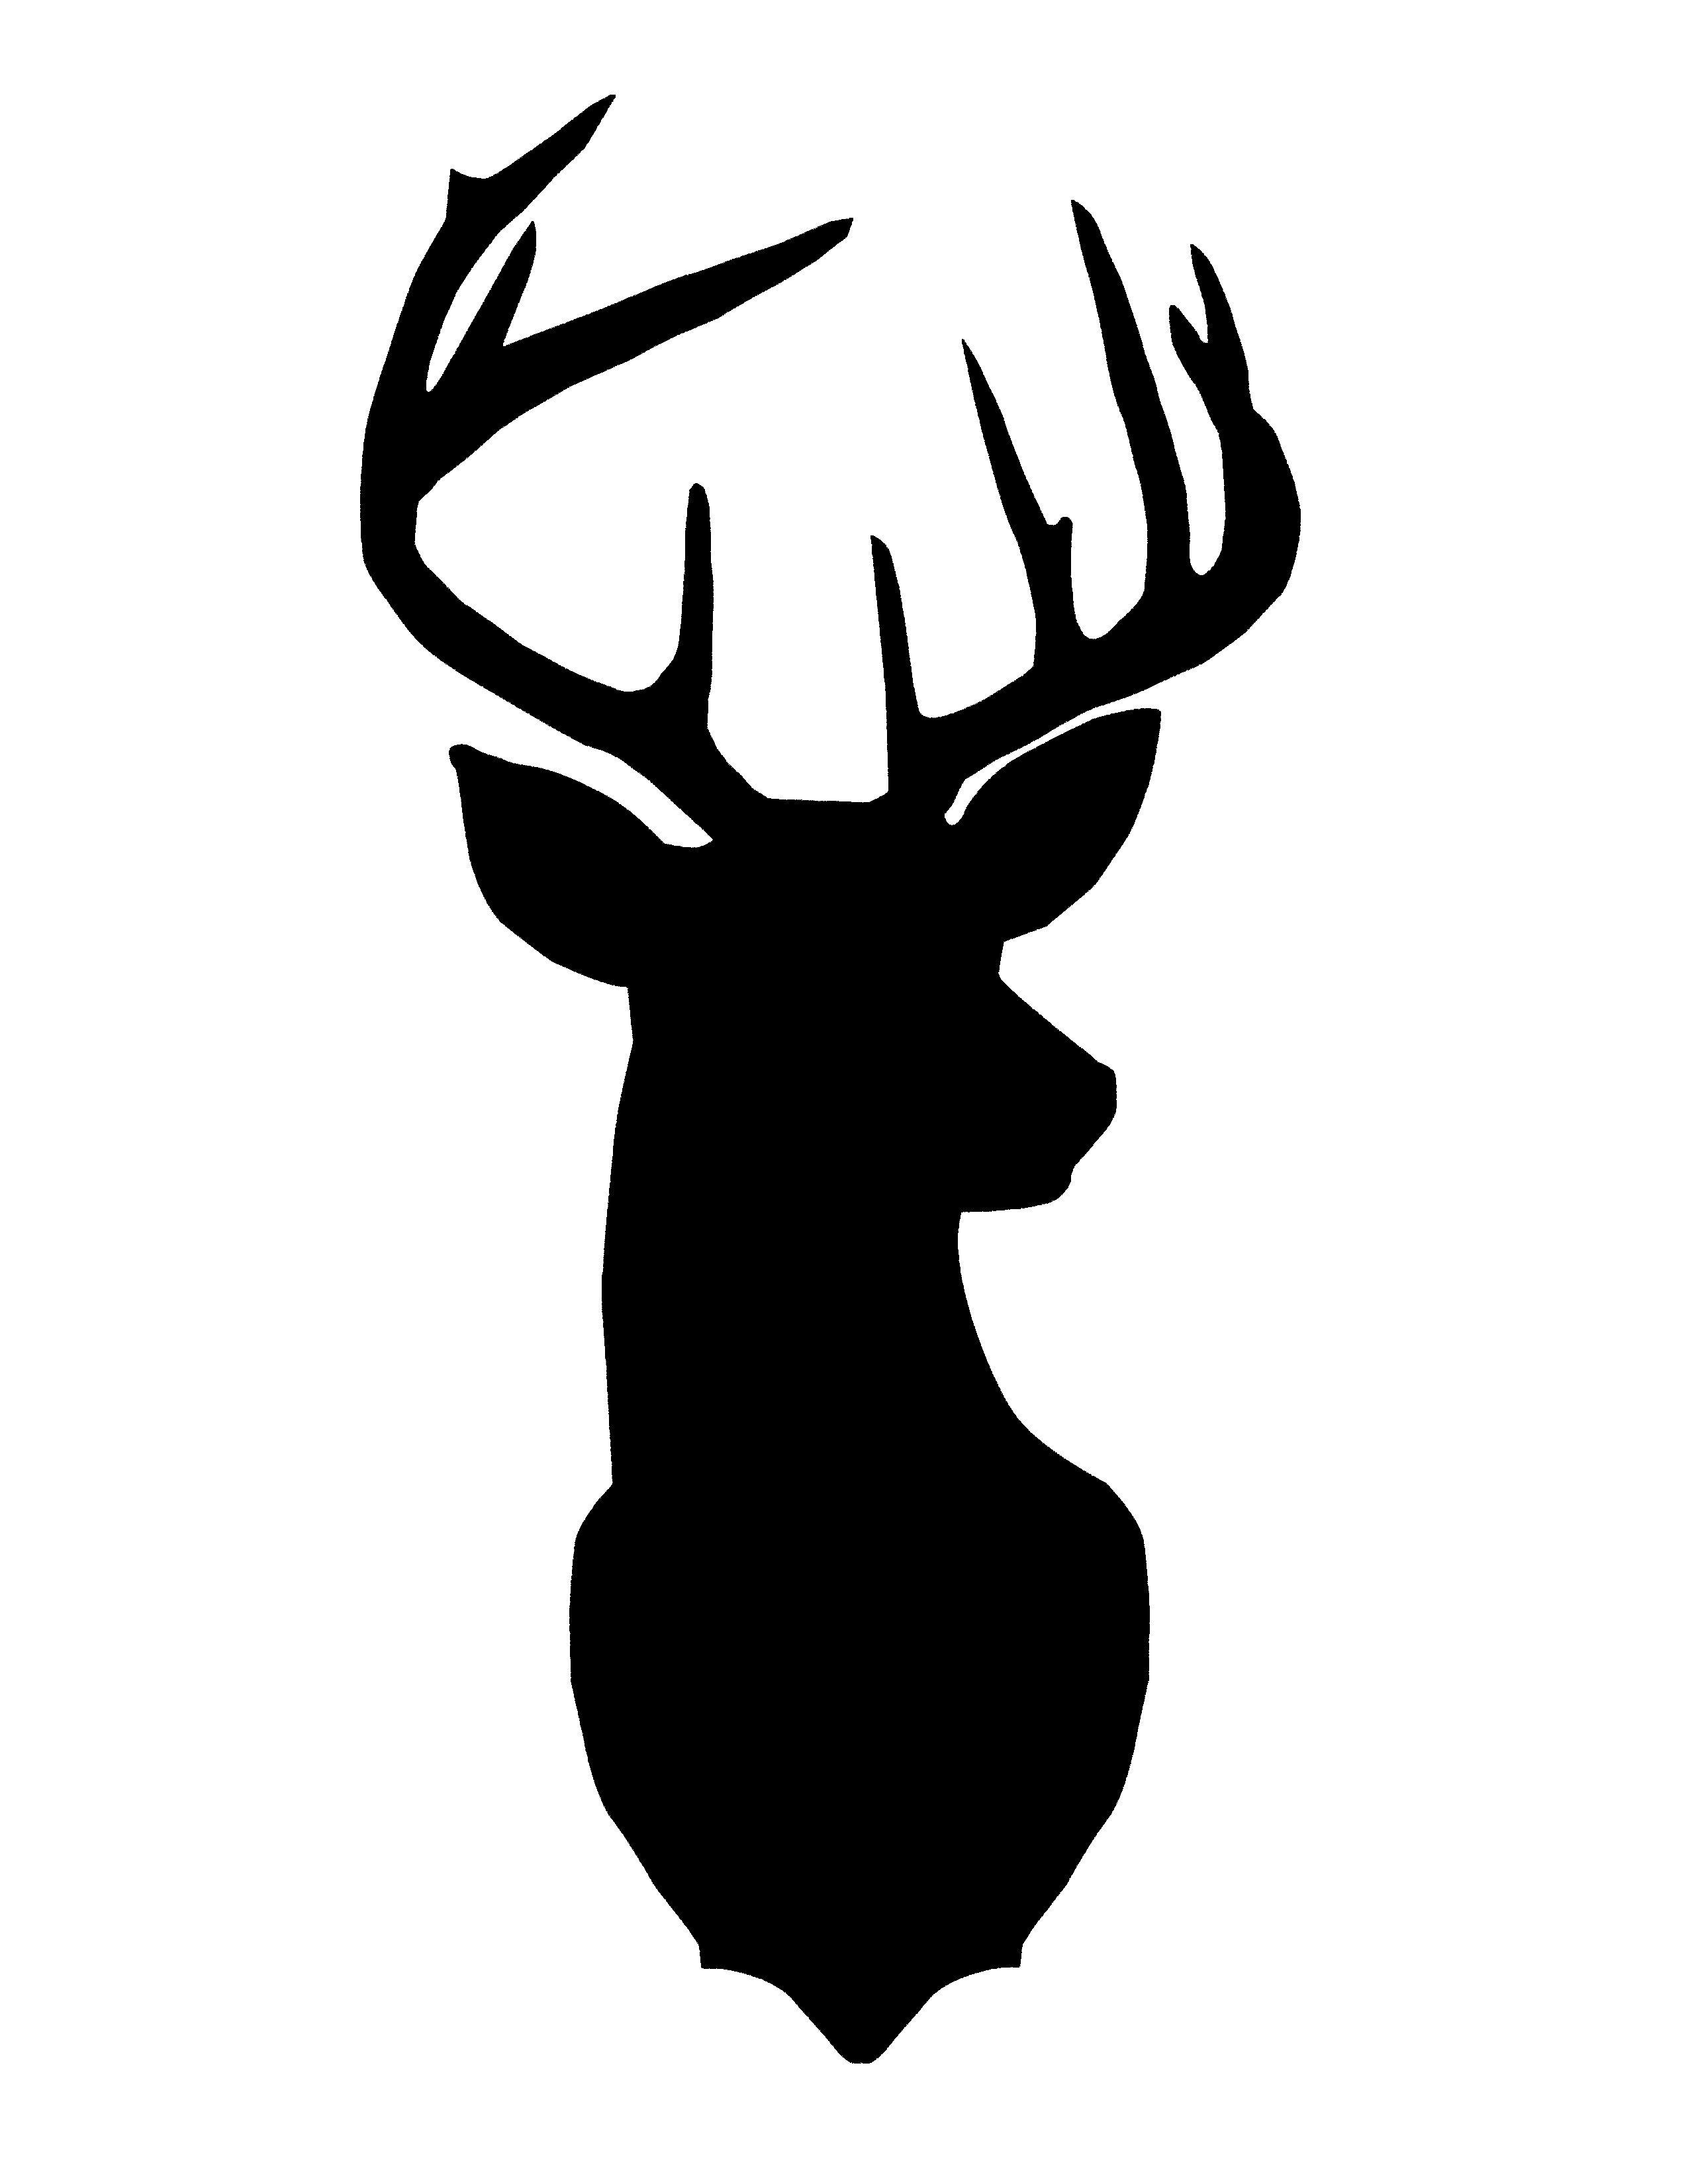 2550x3300 Deer Head Silhouette Clipart